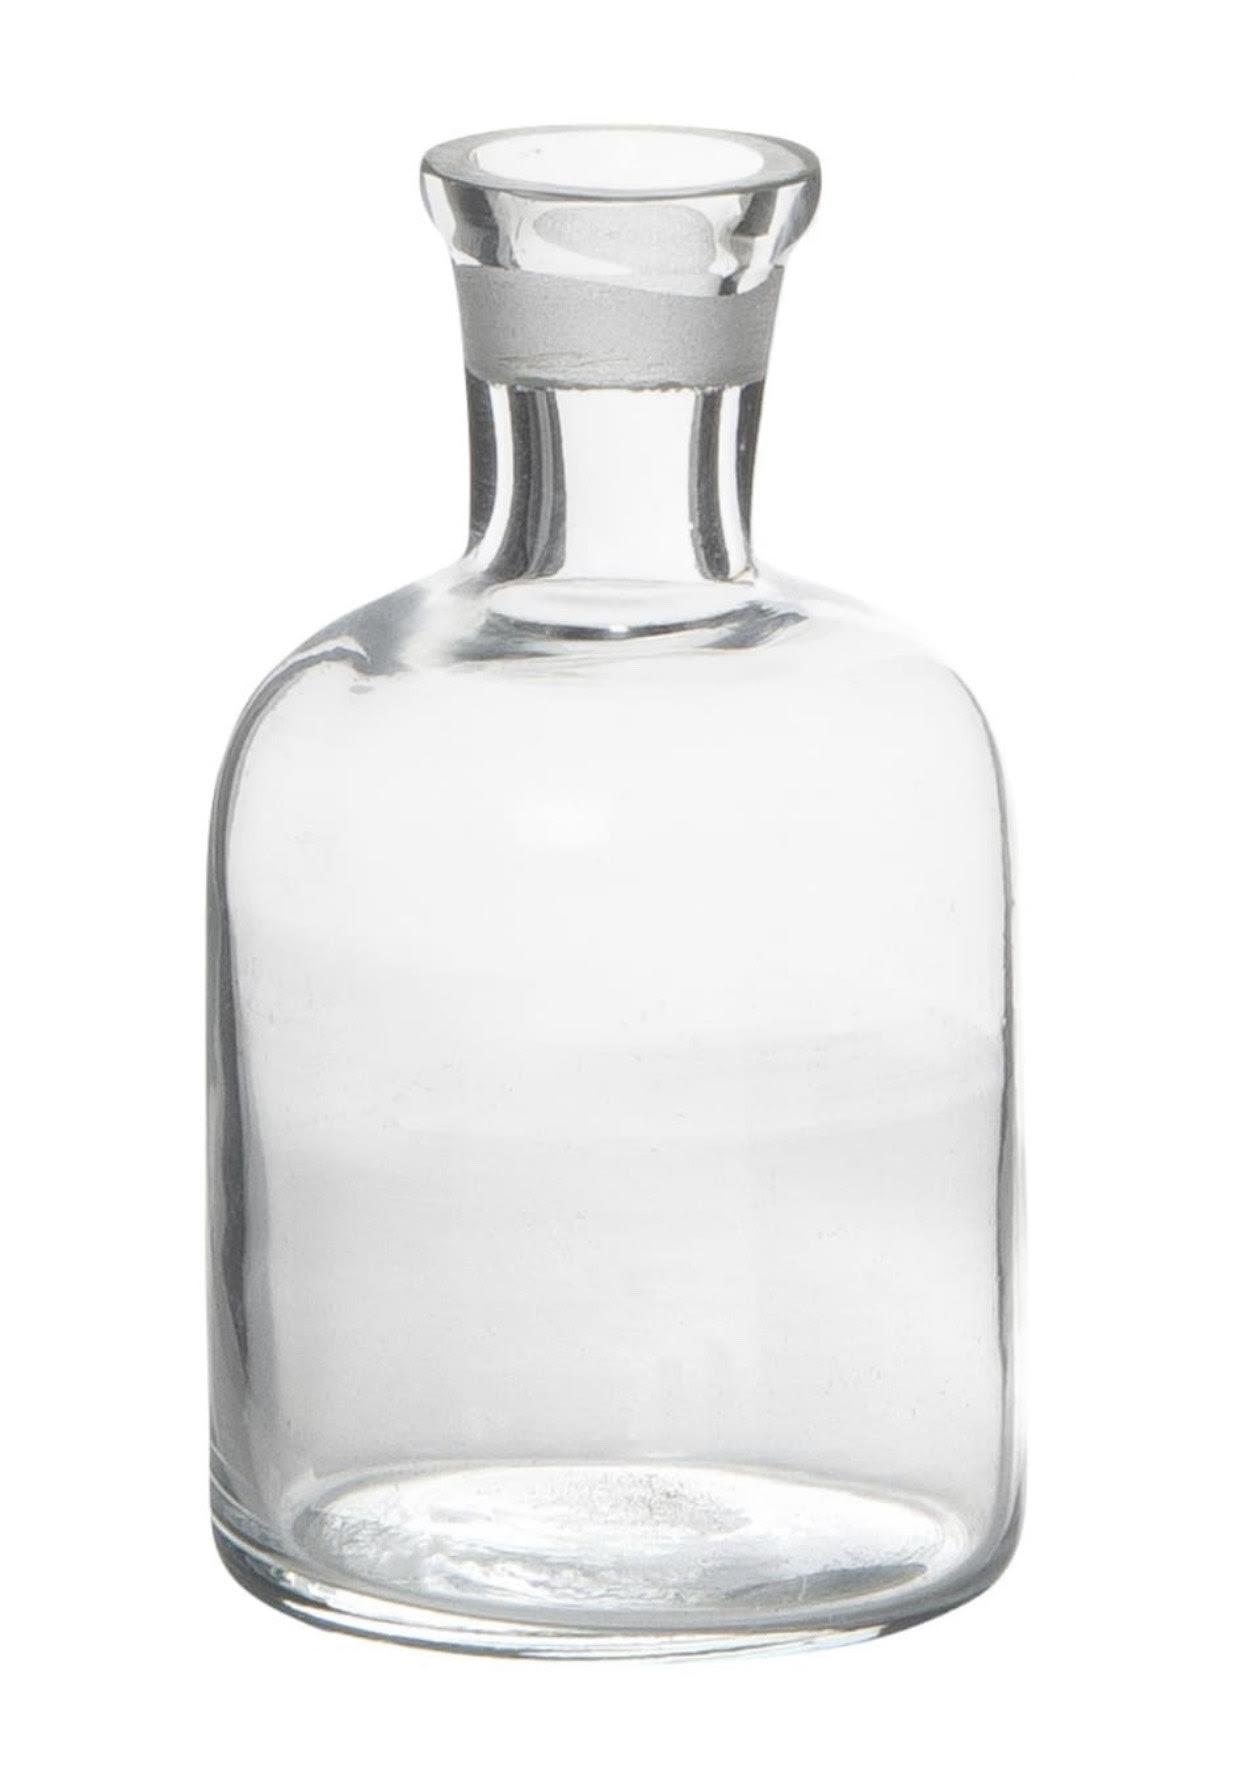 Glass dinner candle holder/vase